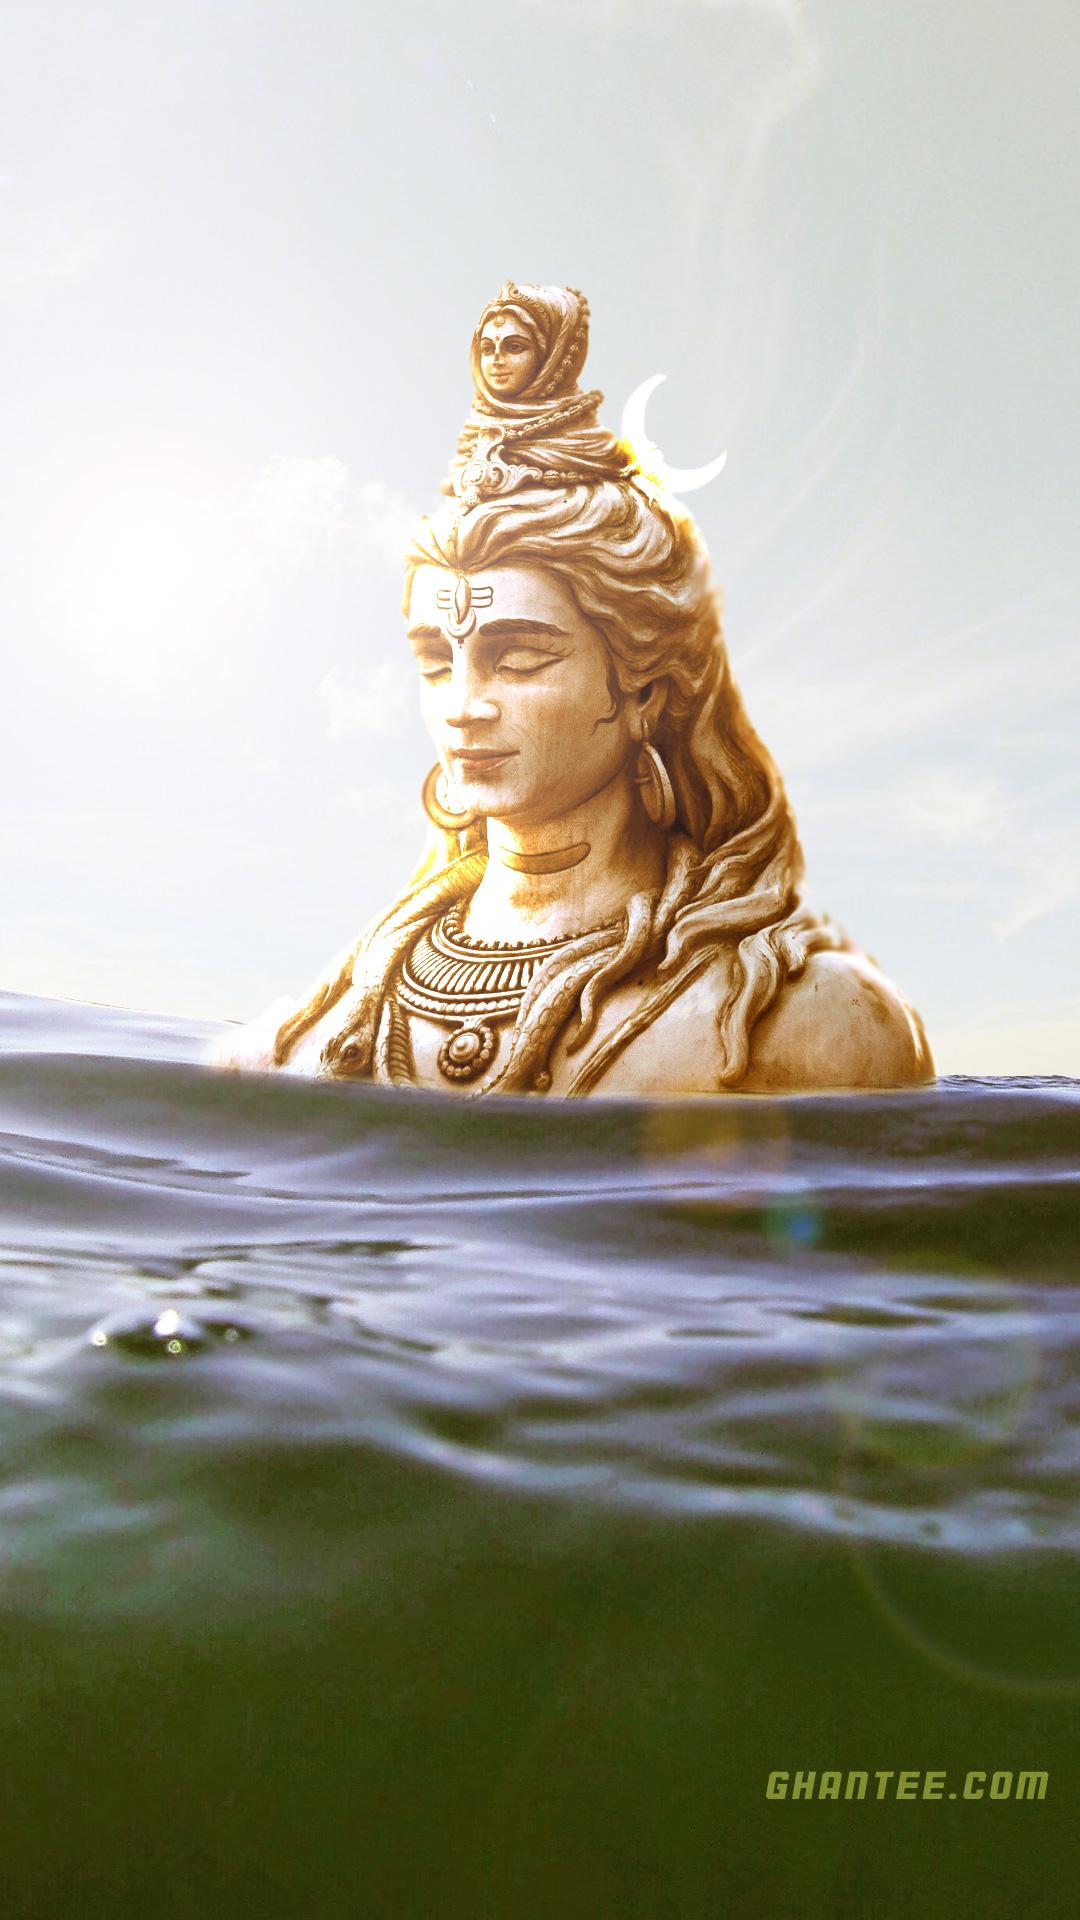 shiva statue in water hd phone wallpaper | 2020